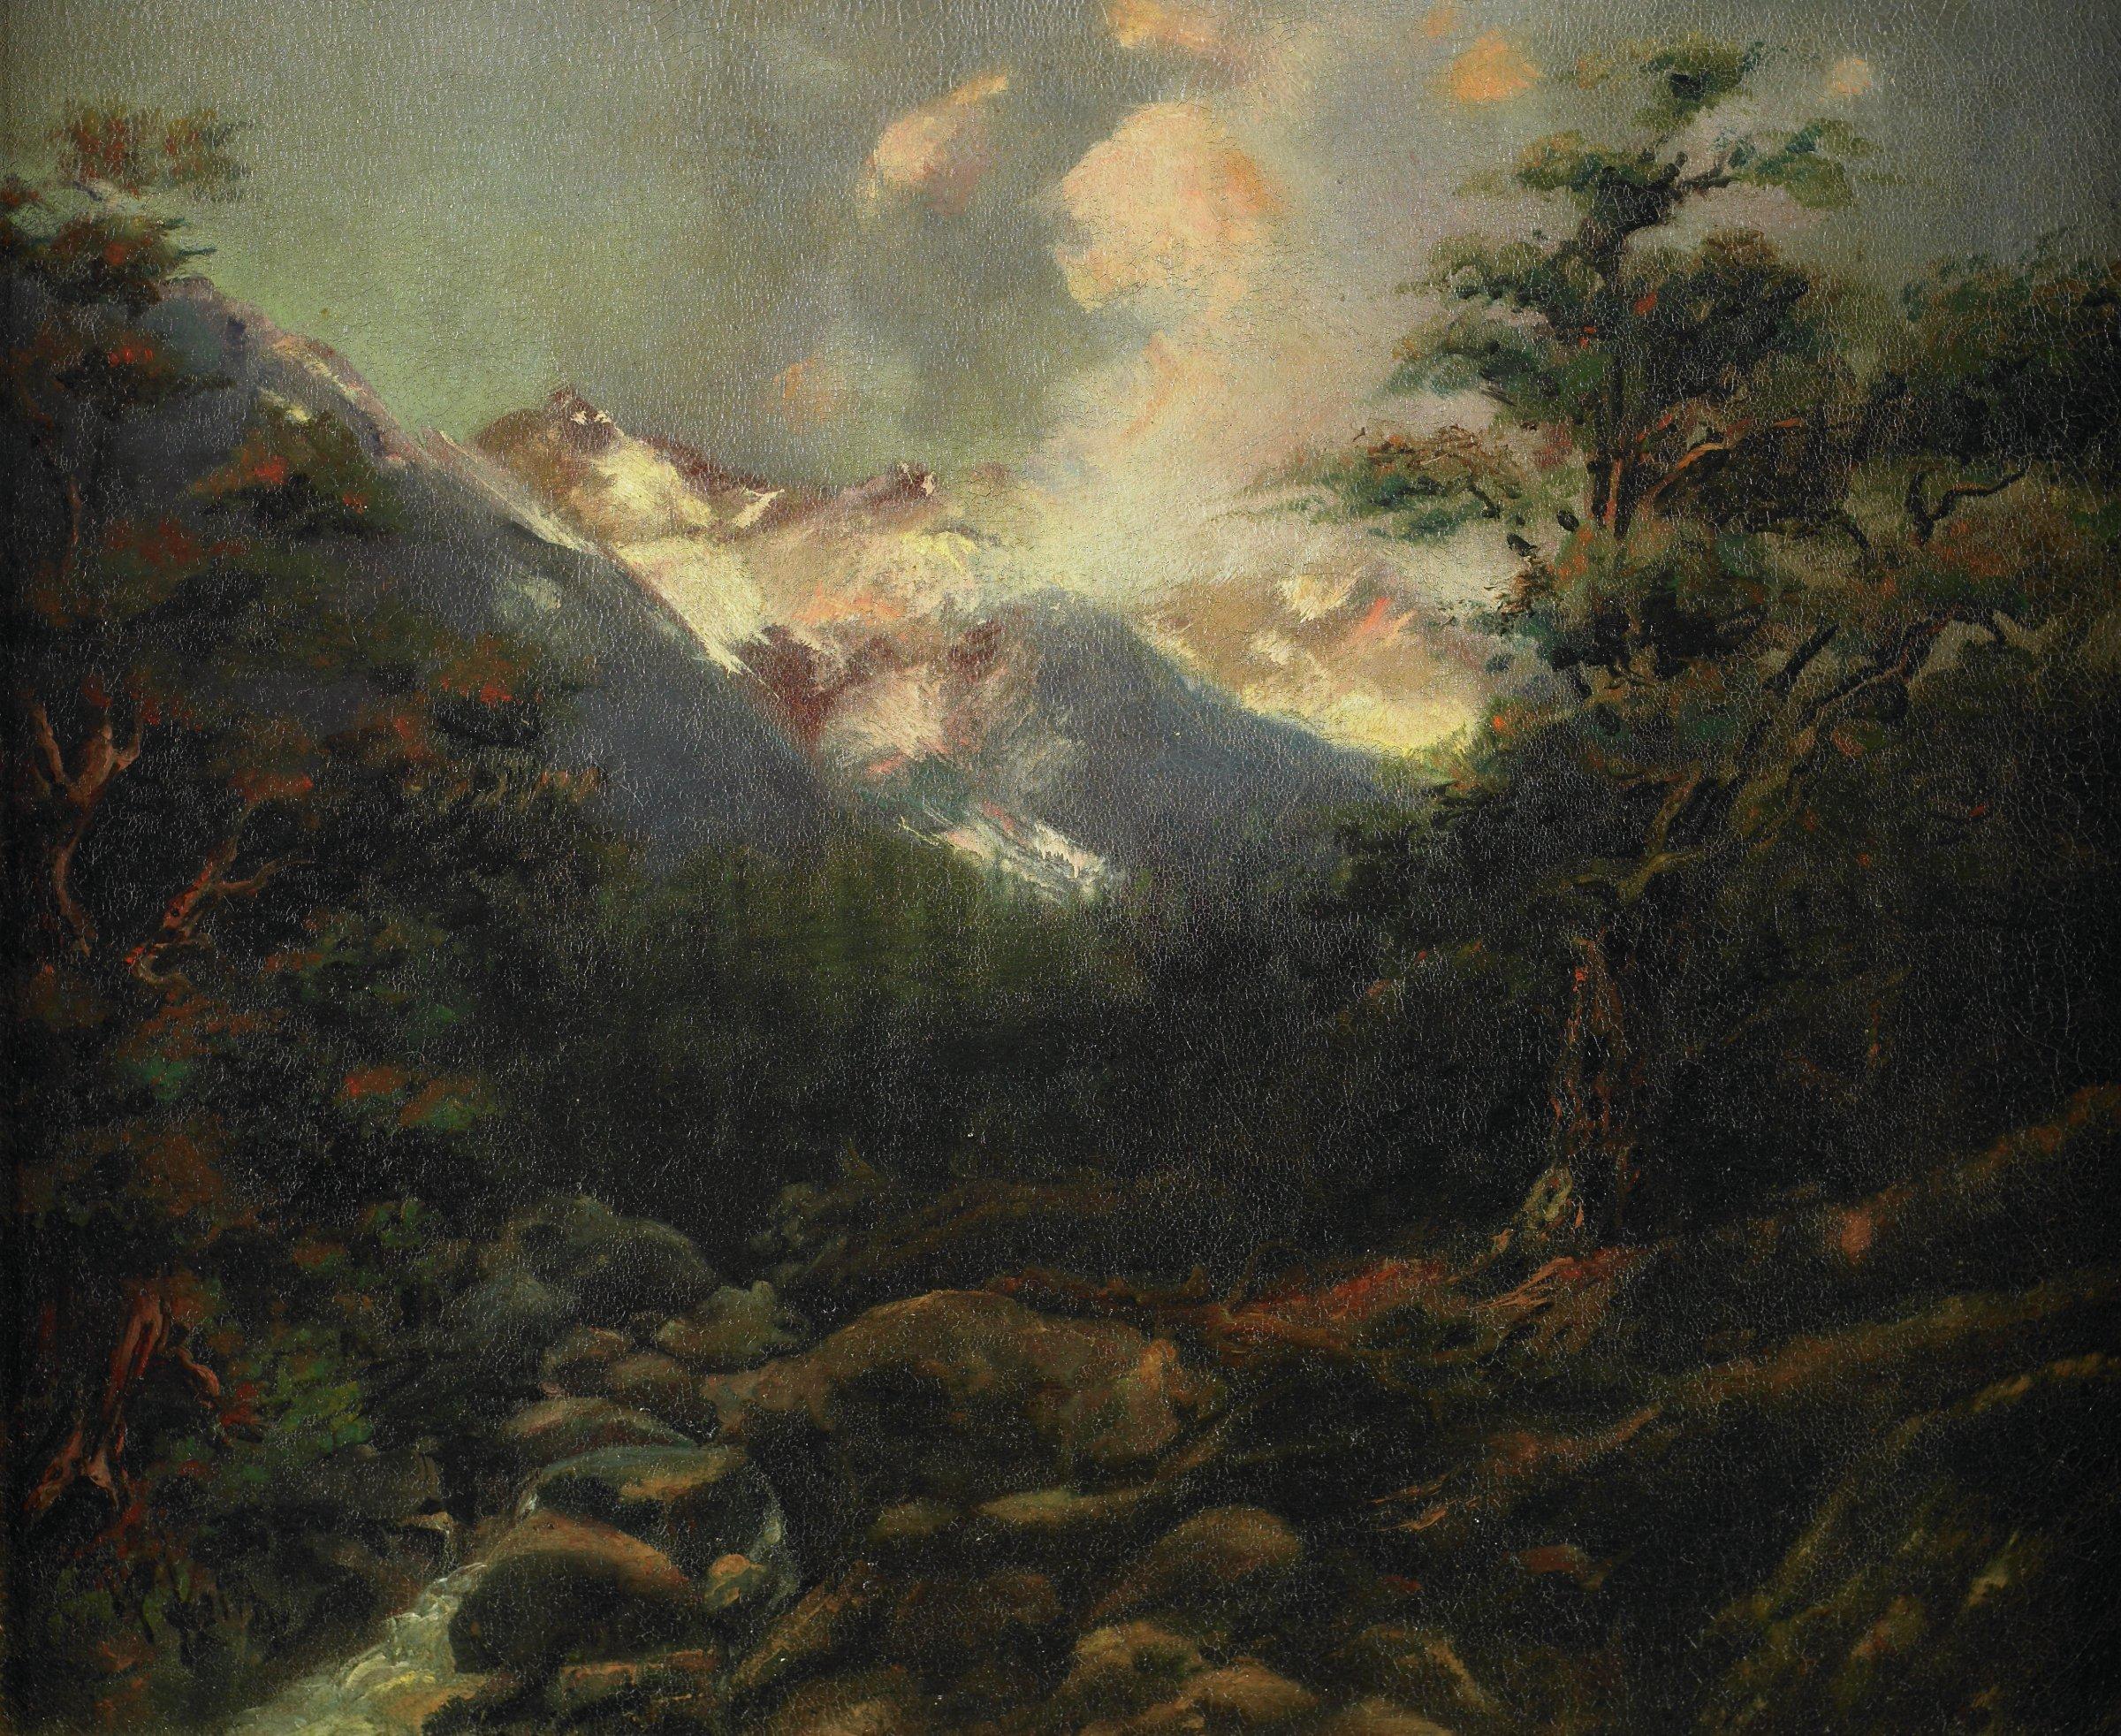 Sierra Storm, William Keith, oil on canvas